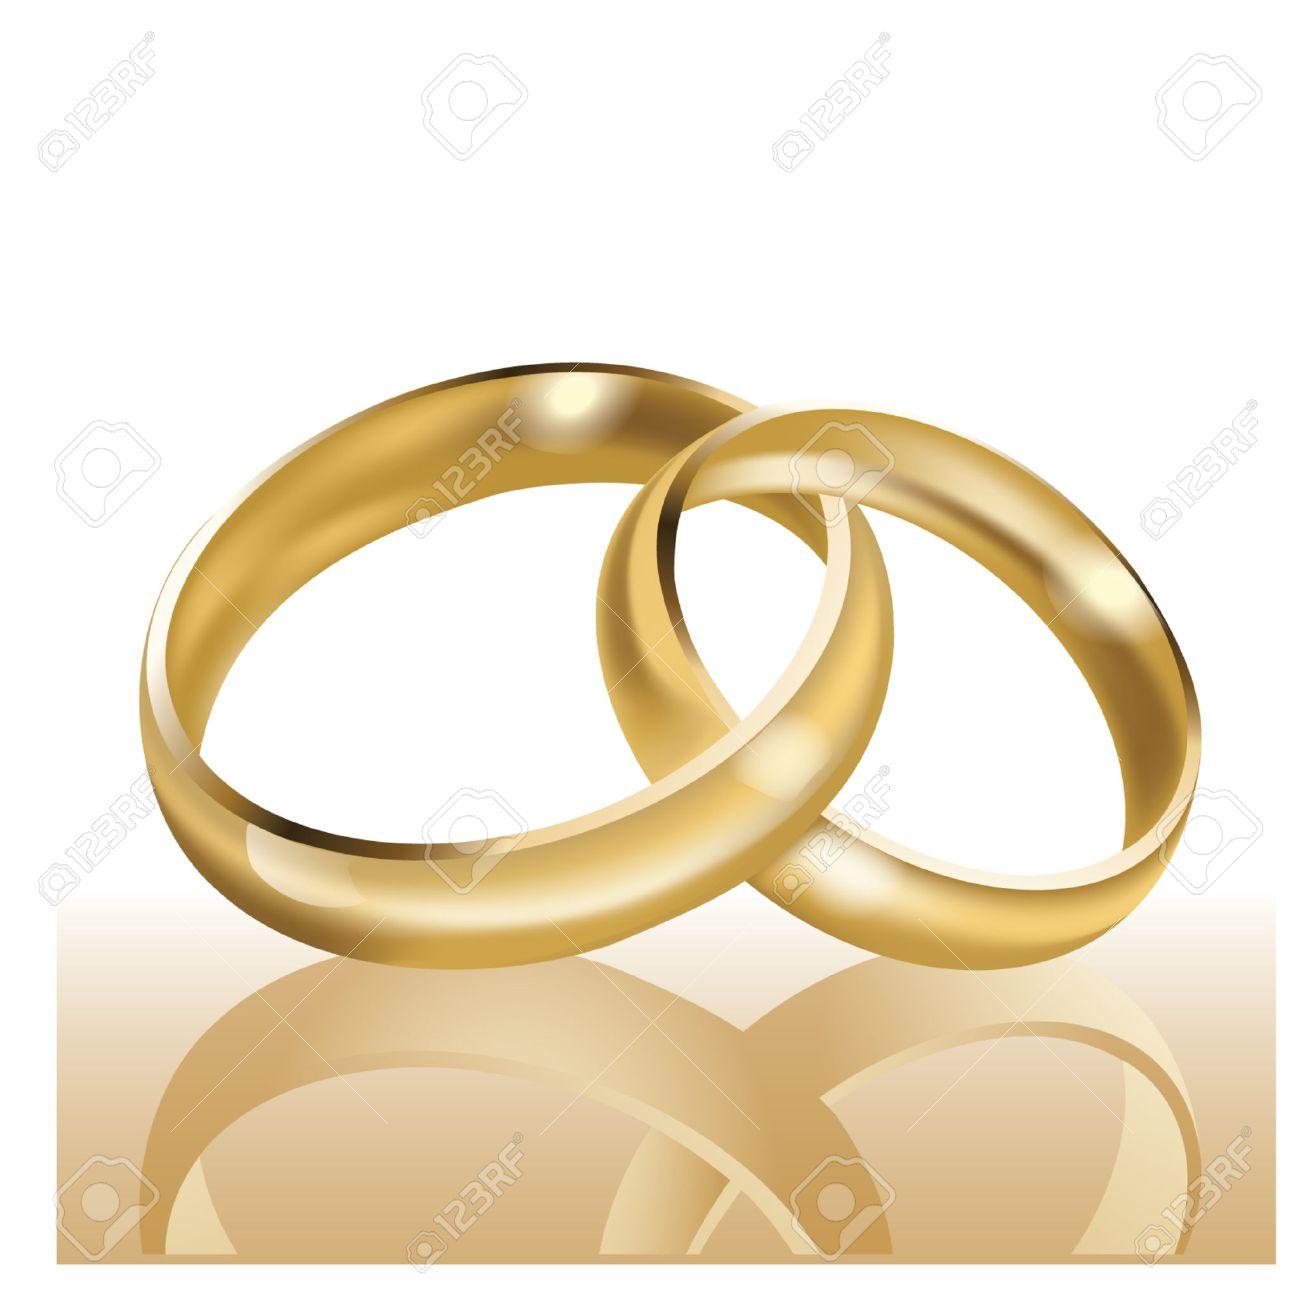 Wedding rings symbol  Wedding Rings, Symbol Of Marriage And Eternal Love Royalty Free ...